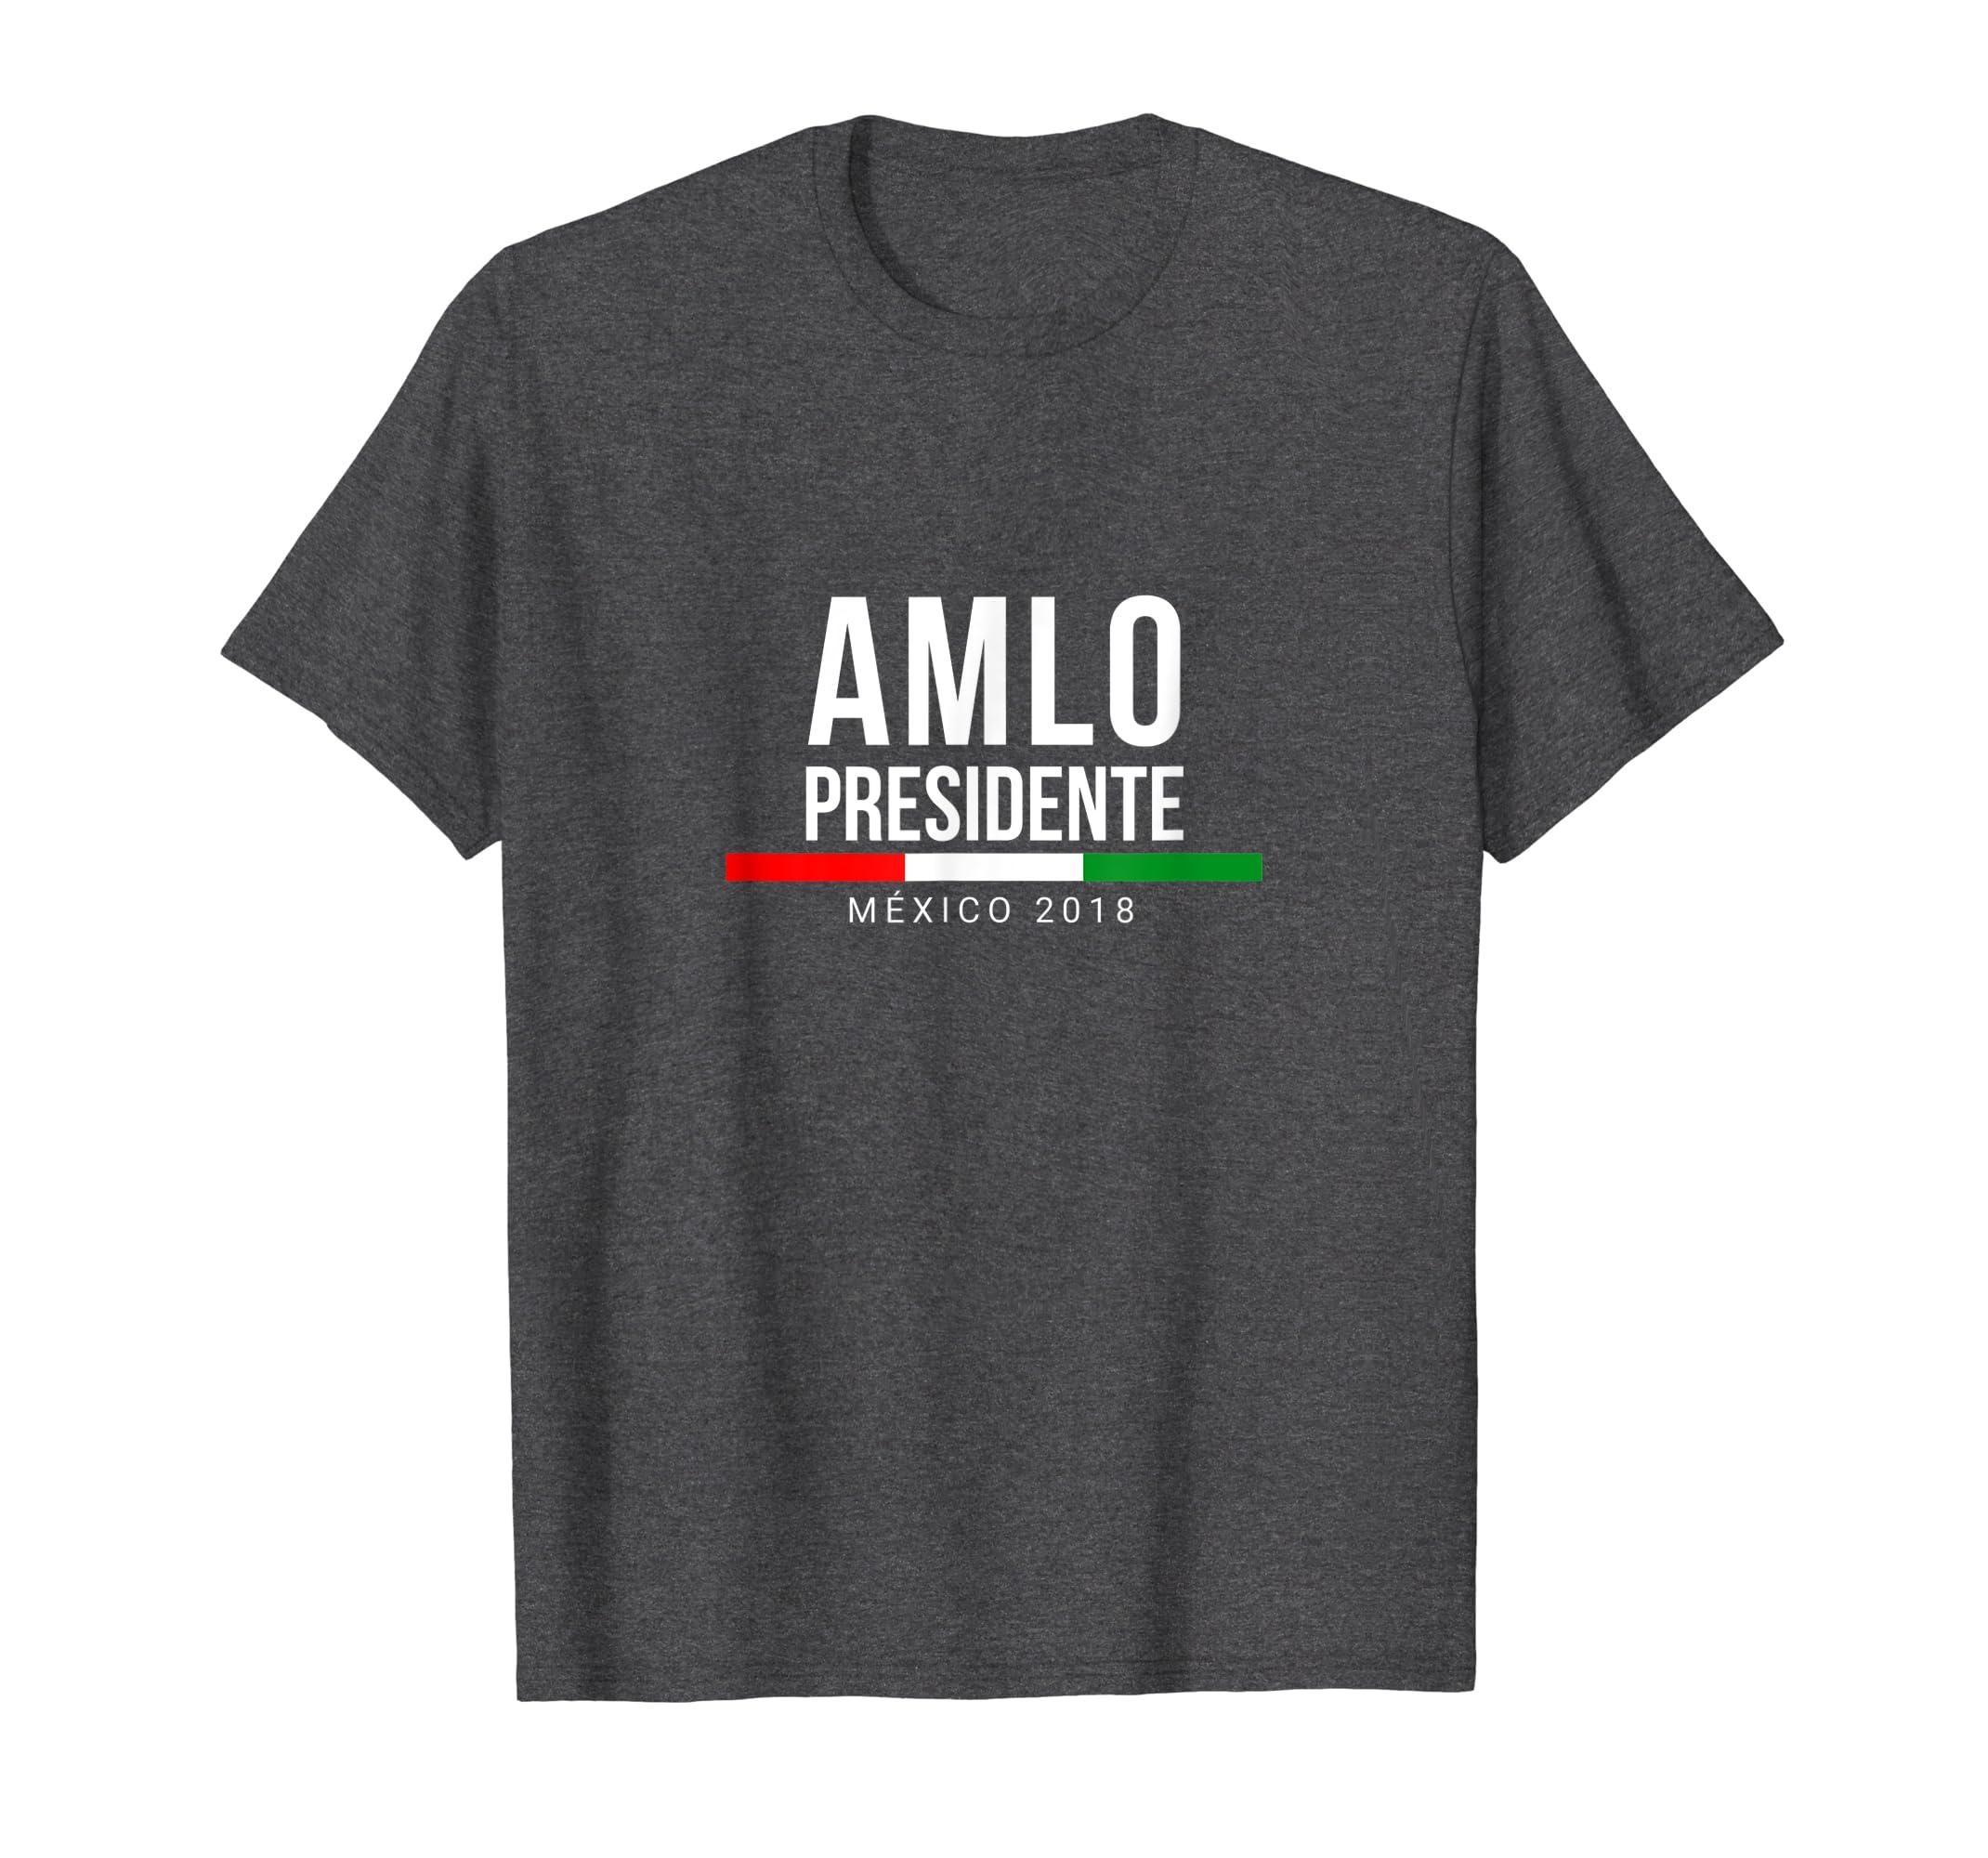 Amazon.com: AMLO Elecciones Mexico 2018 AMLO Presidente T Shirt Gift: Clothing